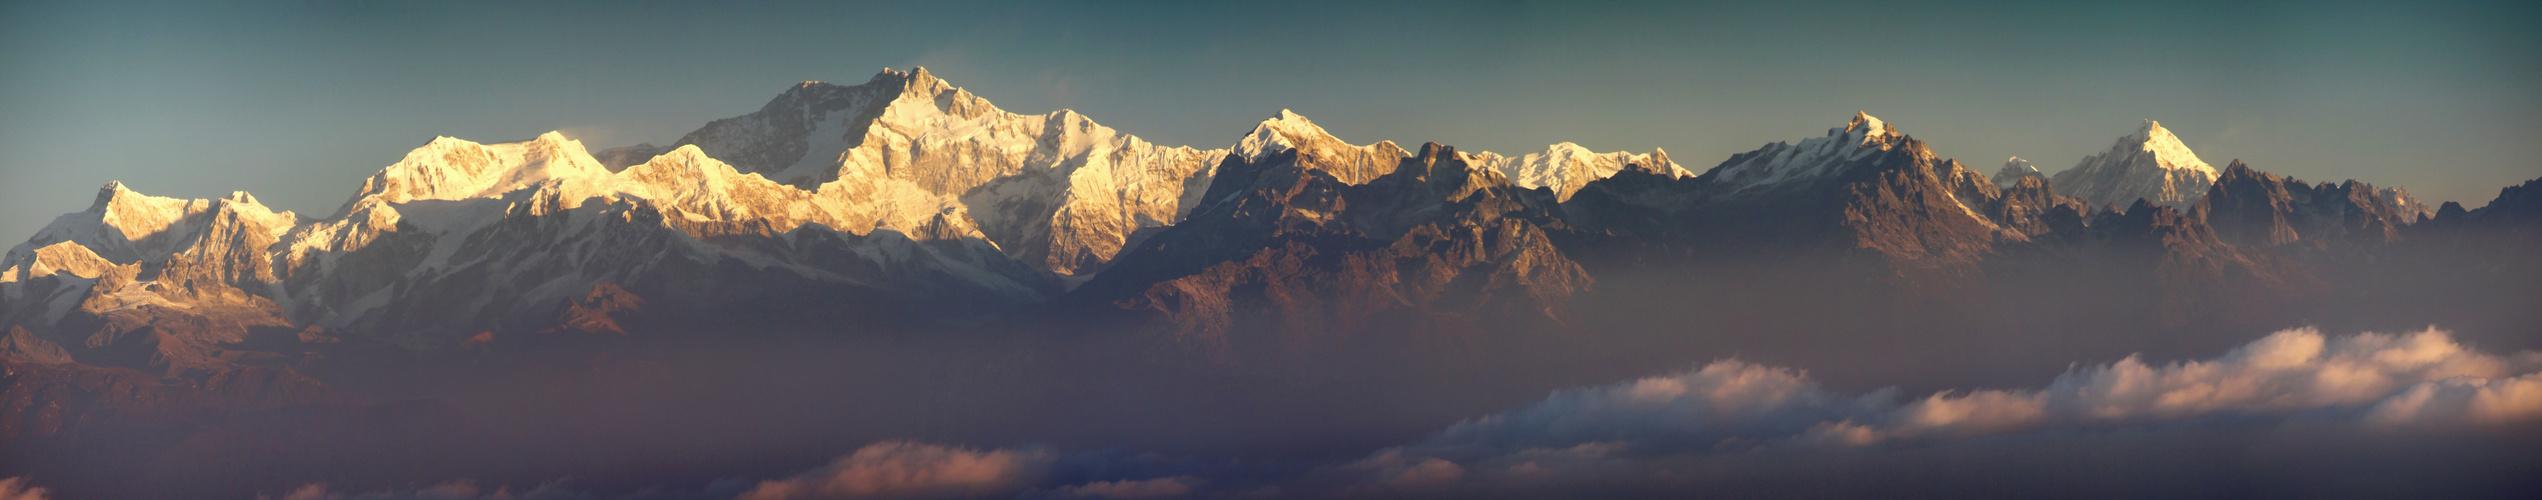 Kangchendzönga 8586m